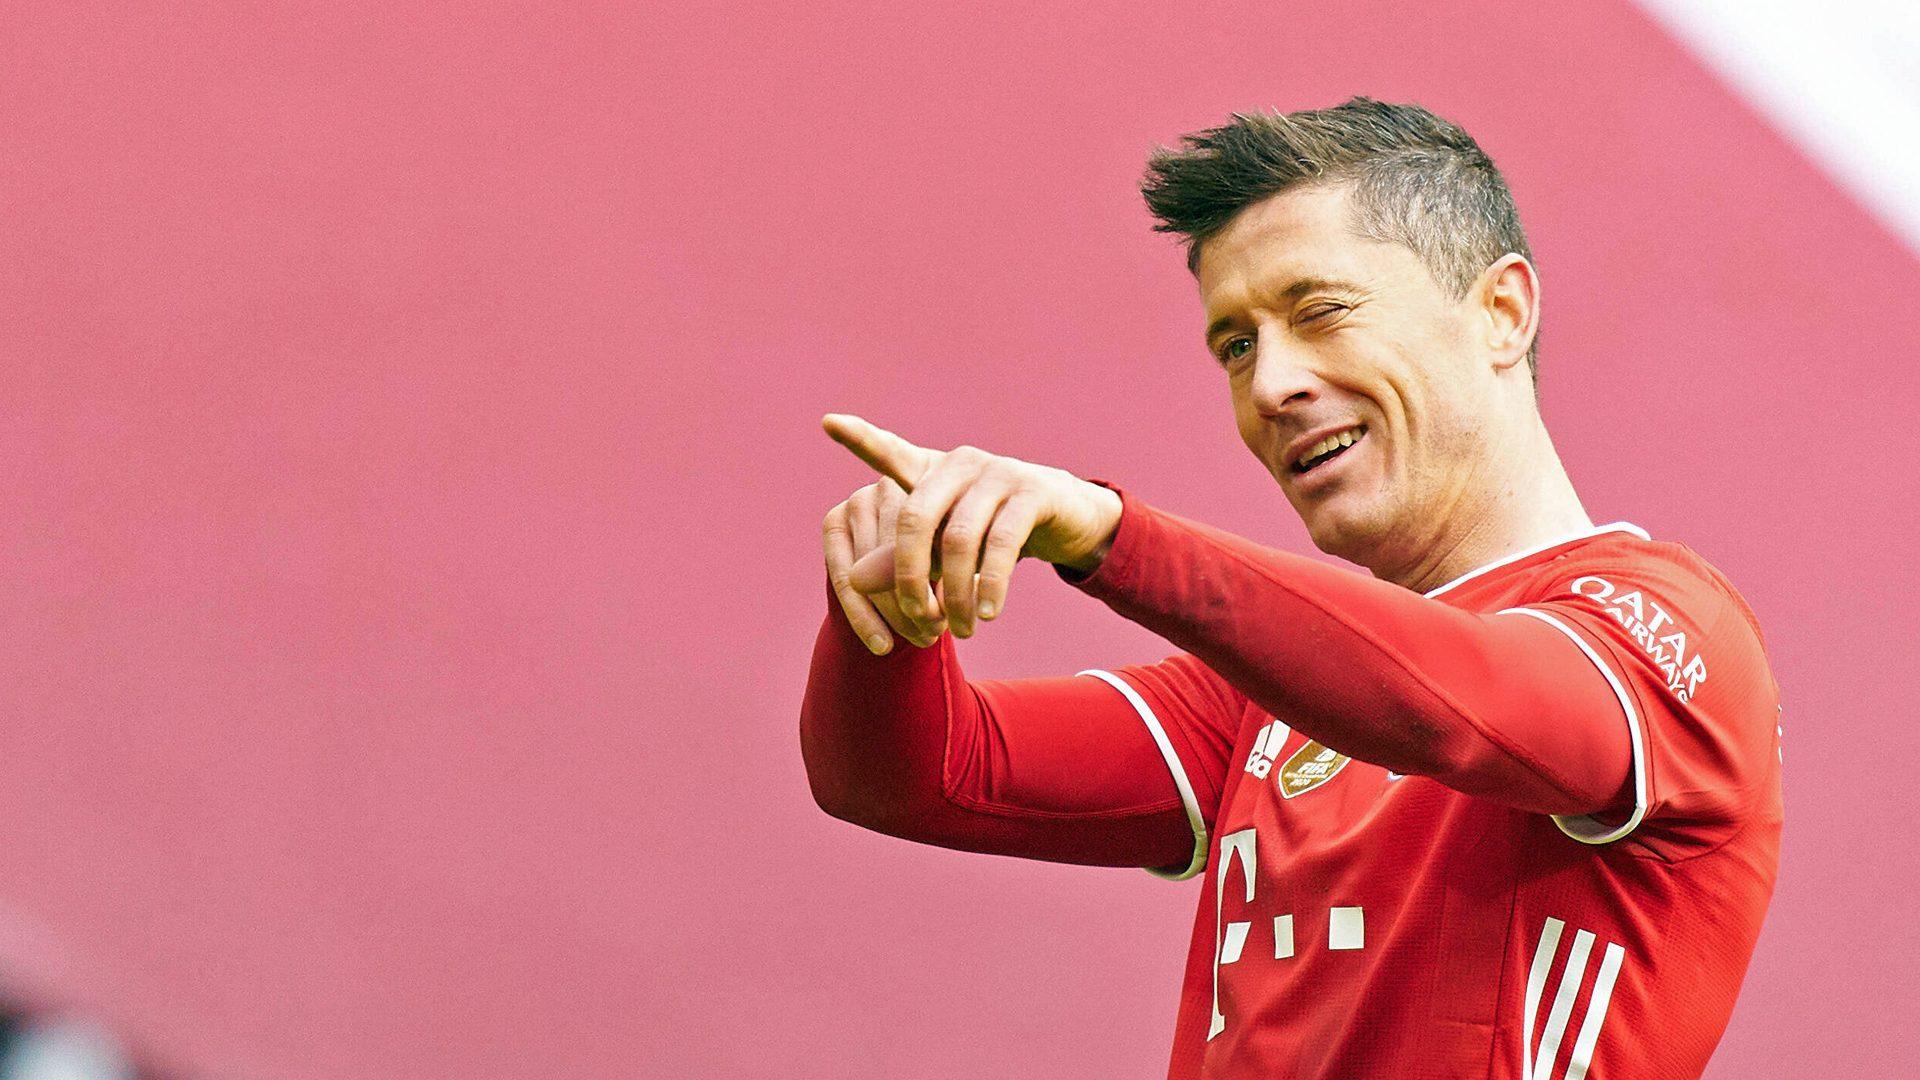 Bundesliga Bayern Munich S Robert Lewandowski Eyeing Scoring Record On Return